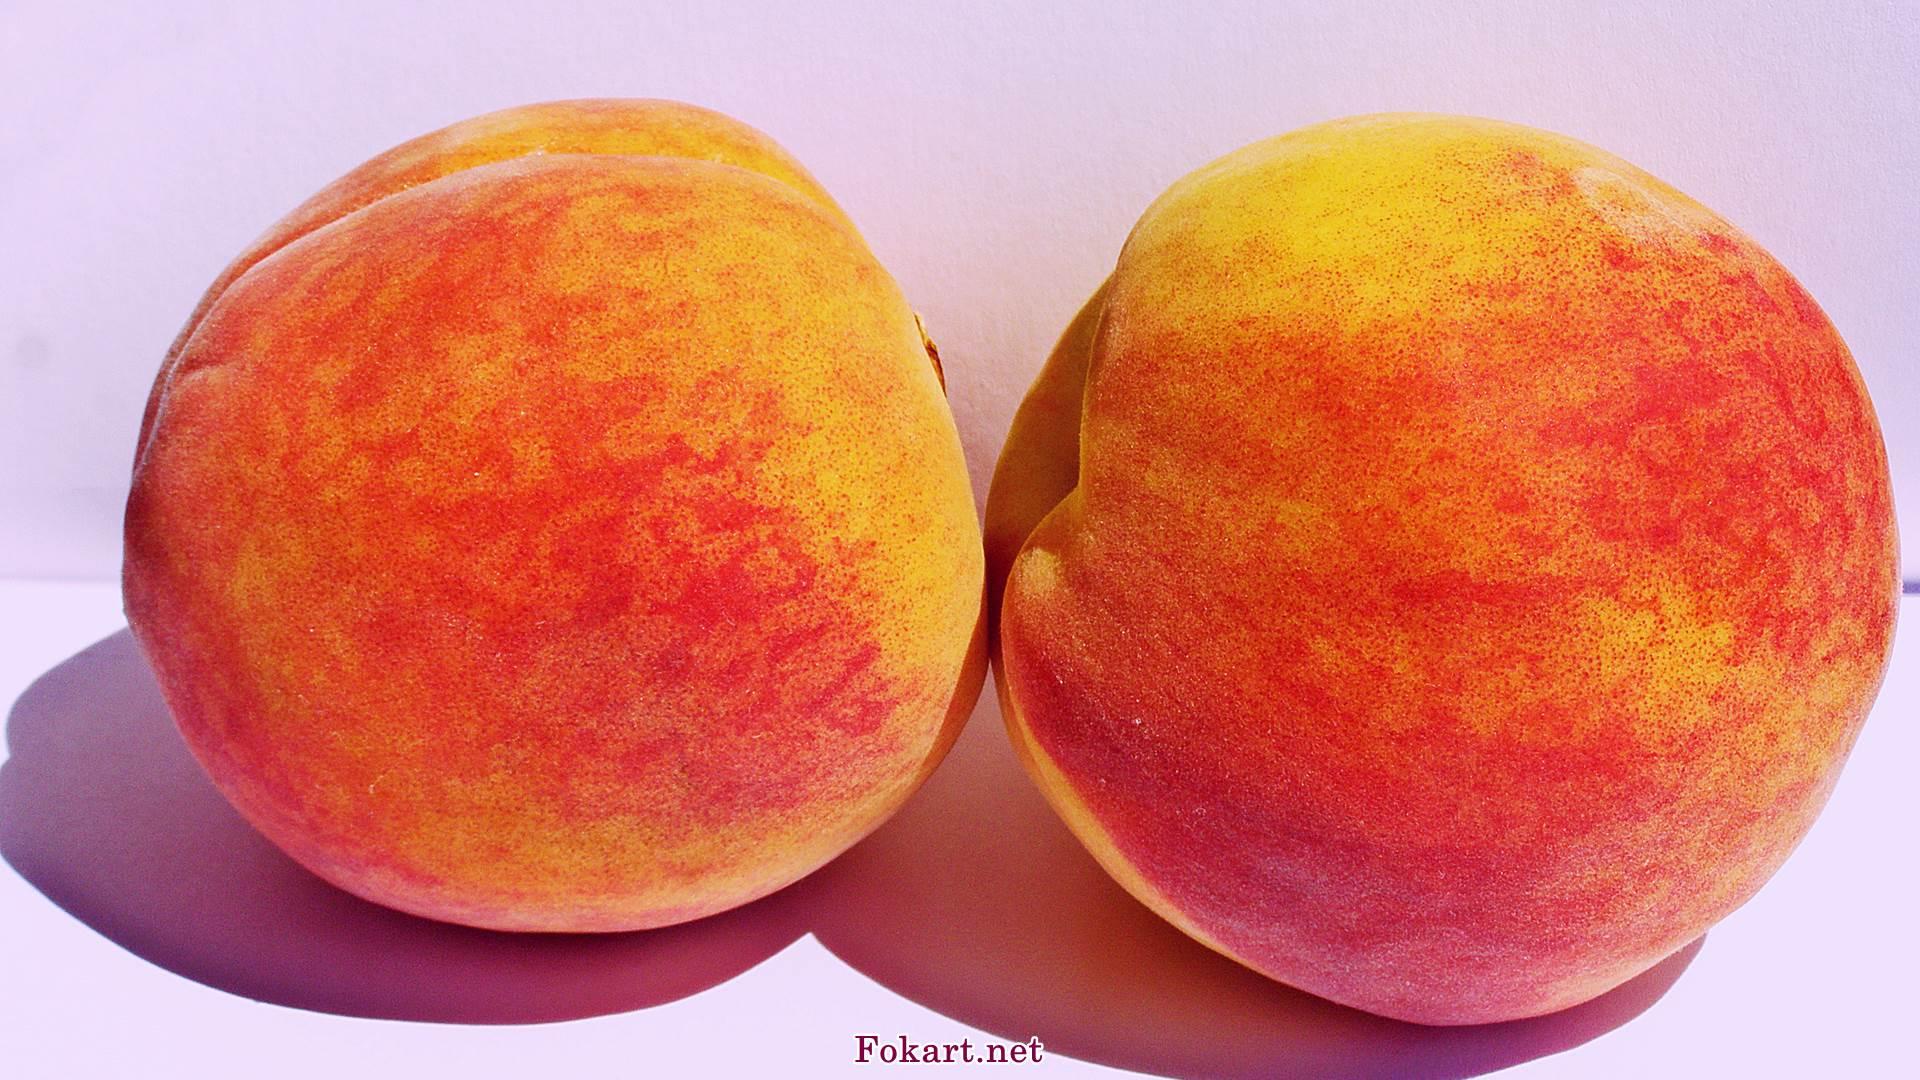 Два персика на весь экран